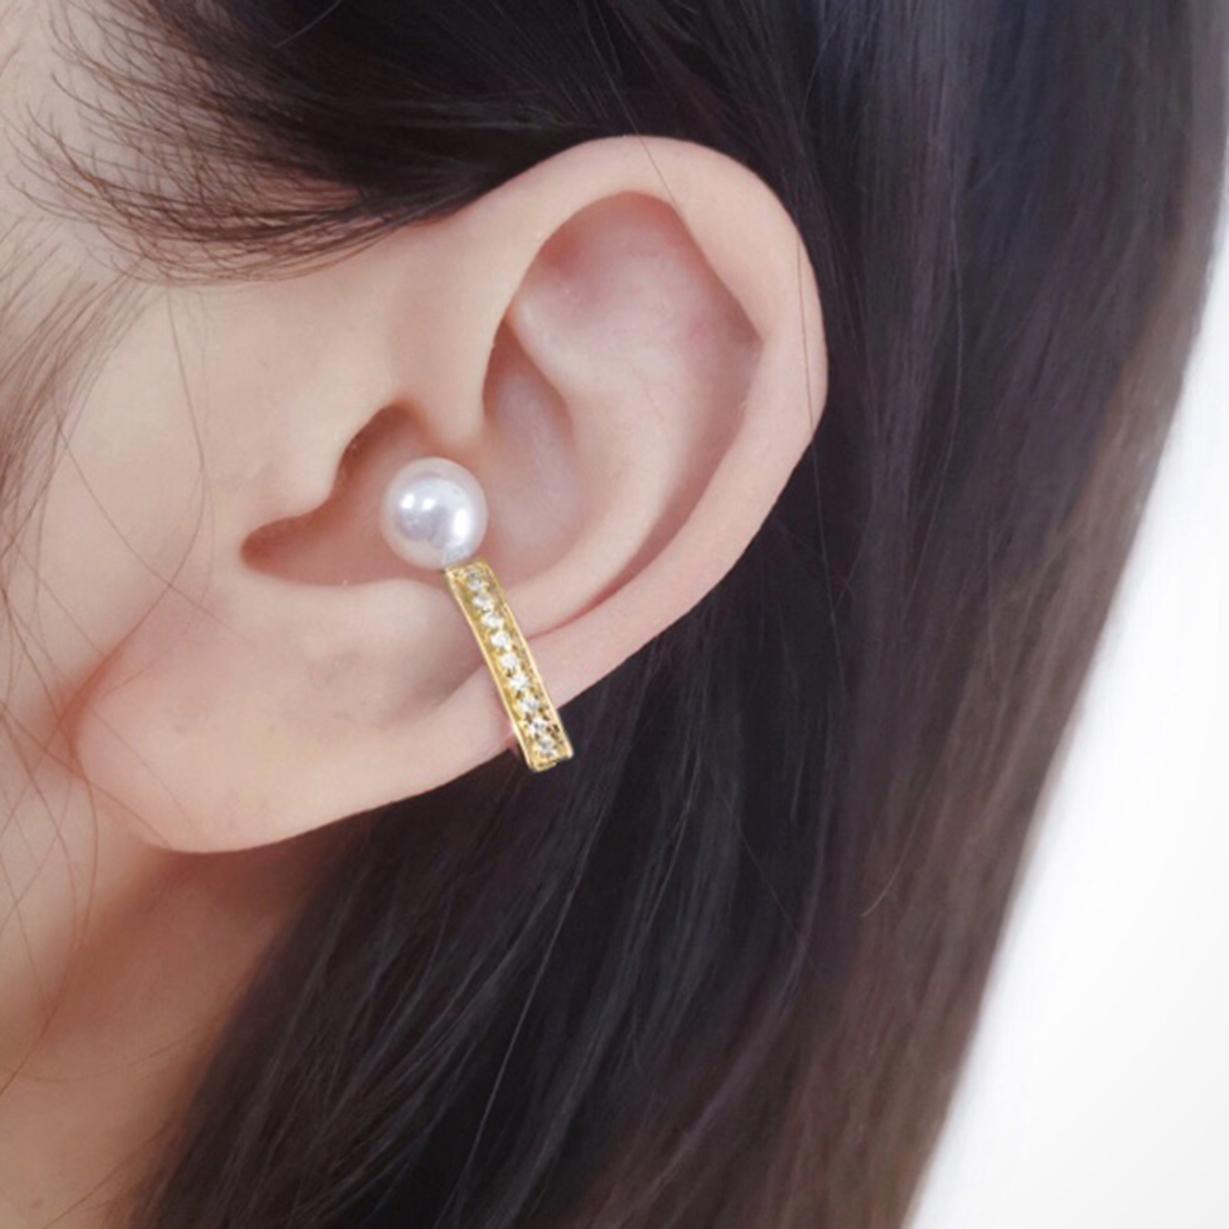 Adira Statement Ear Cuff